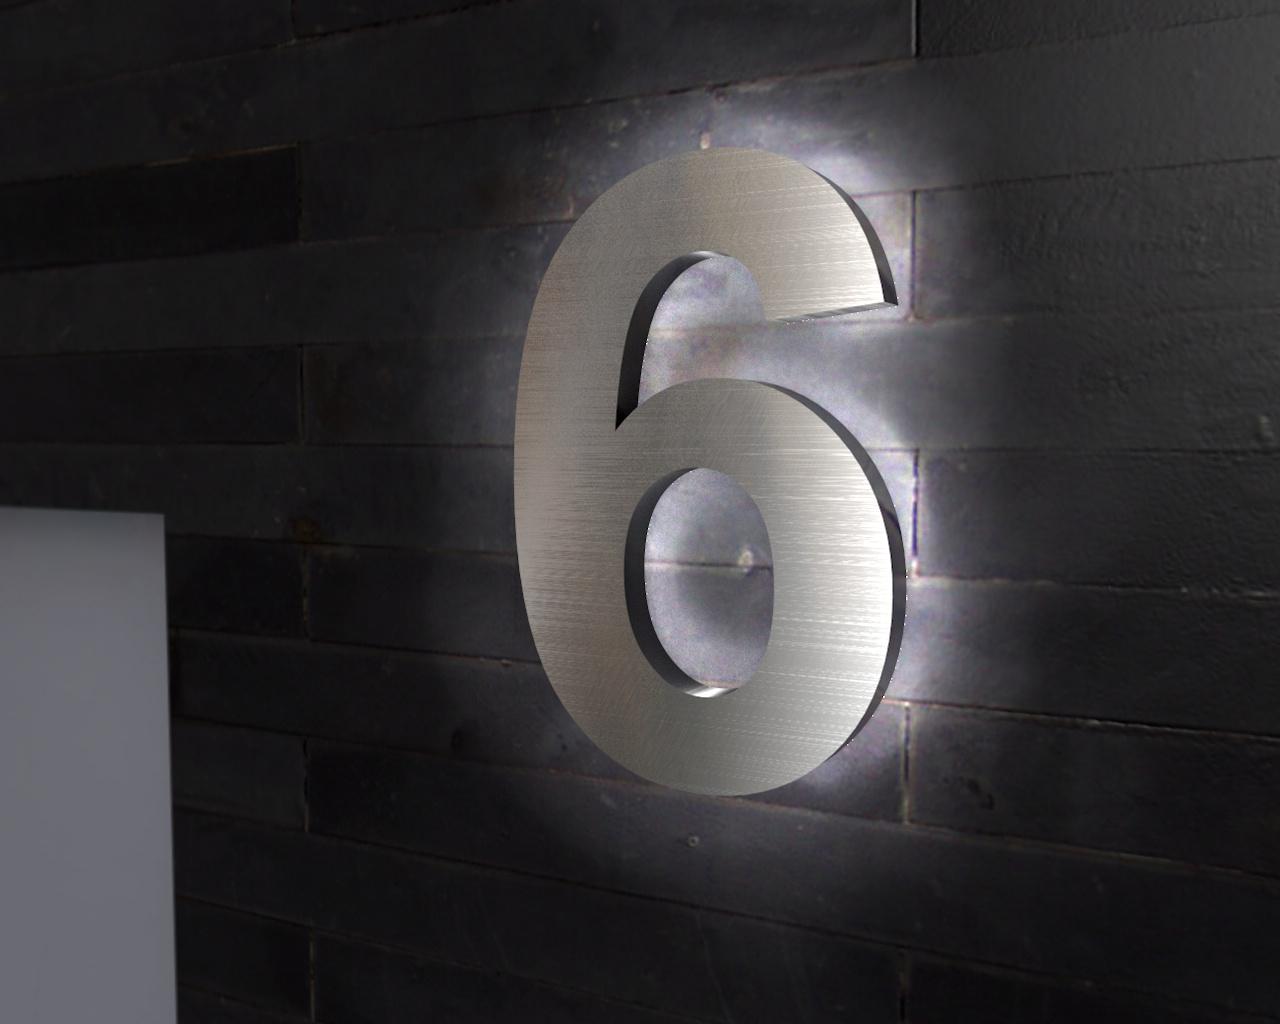 Beleuchtete Hausnummer 6 Ambilight